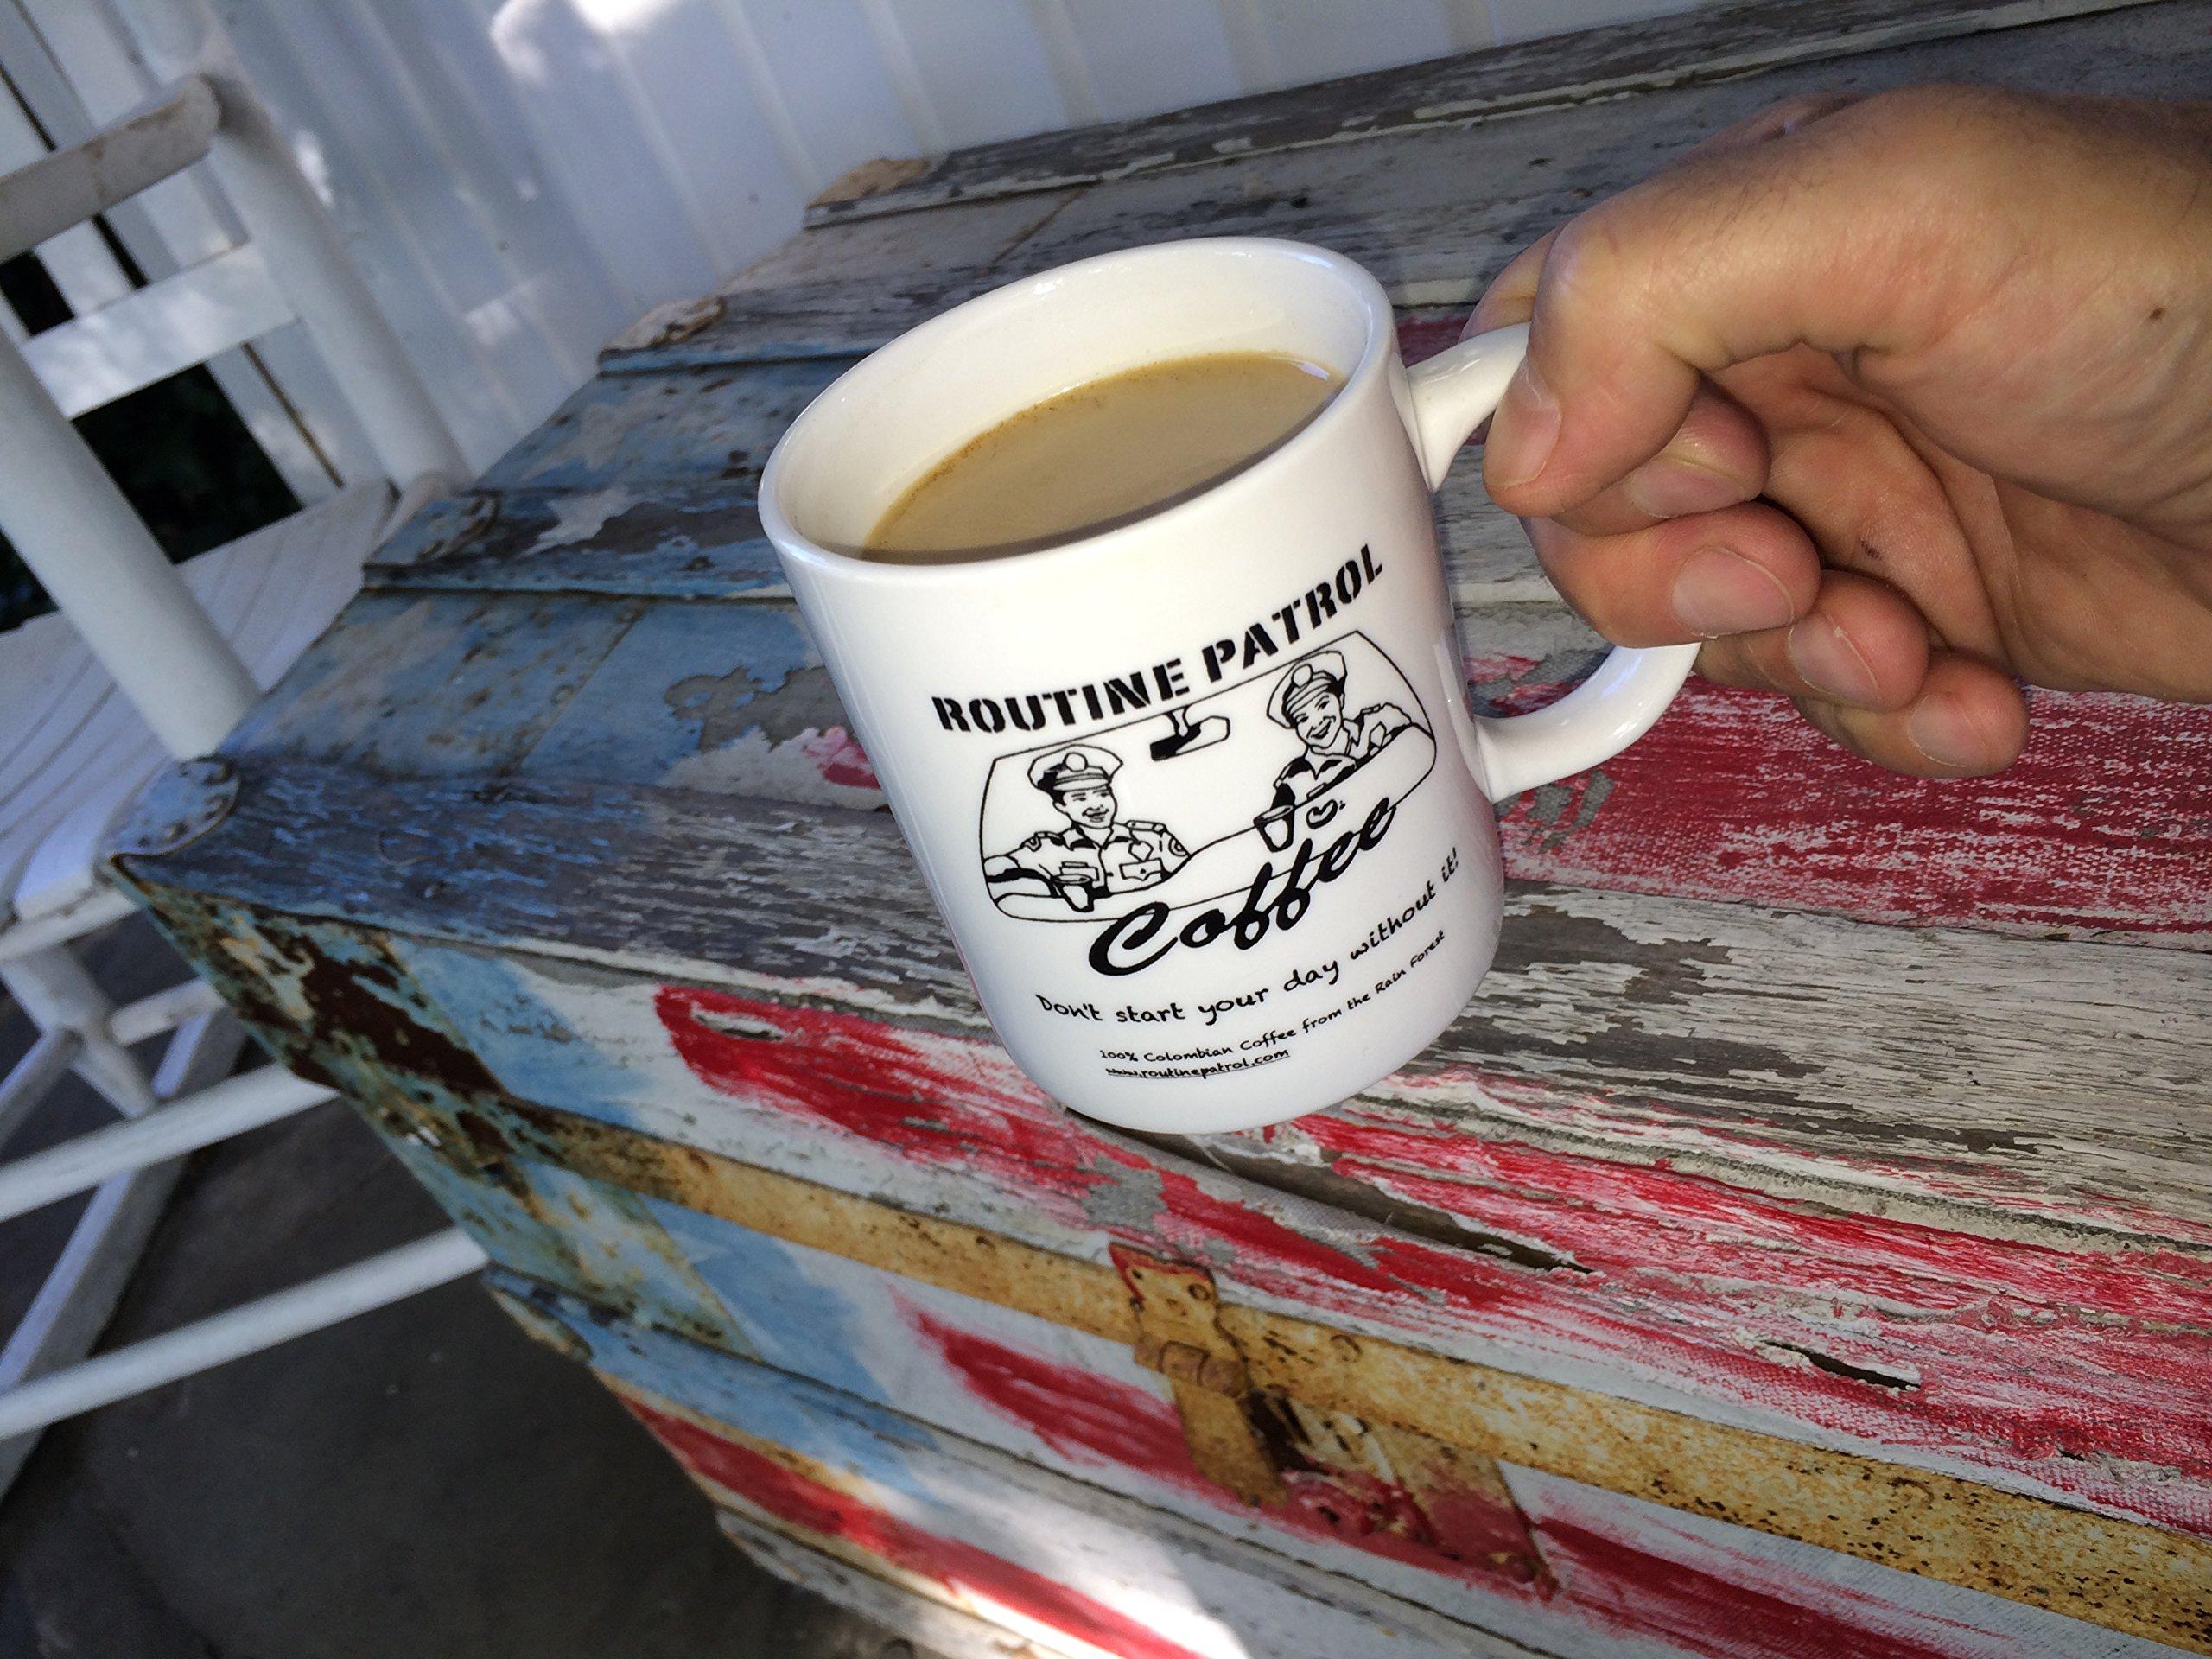 Organic Routine Patrol Colombian Coffee